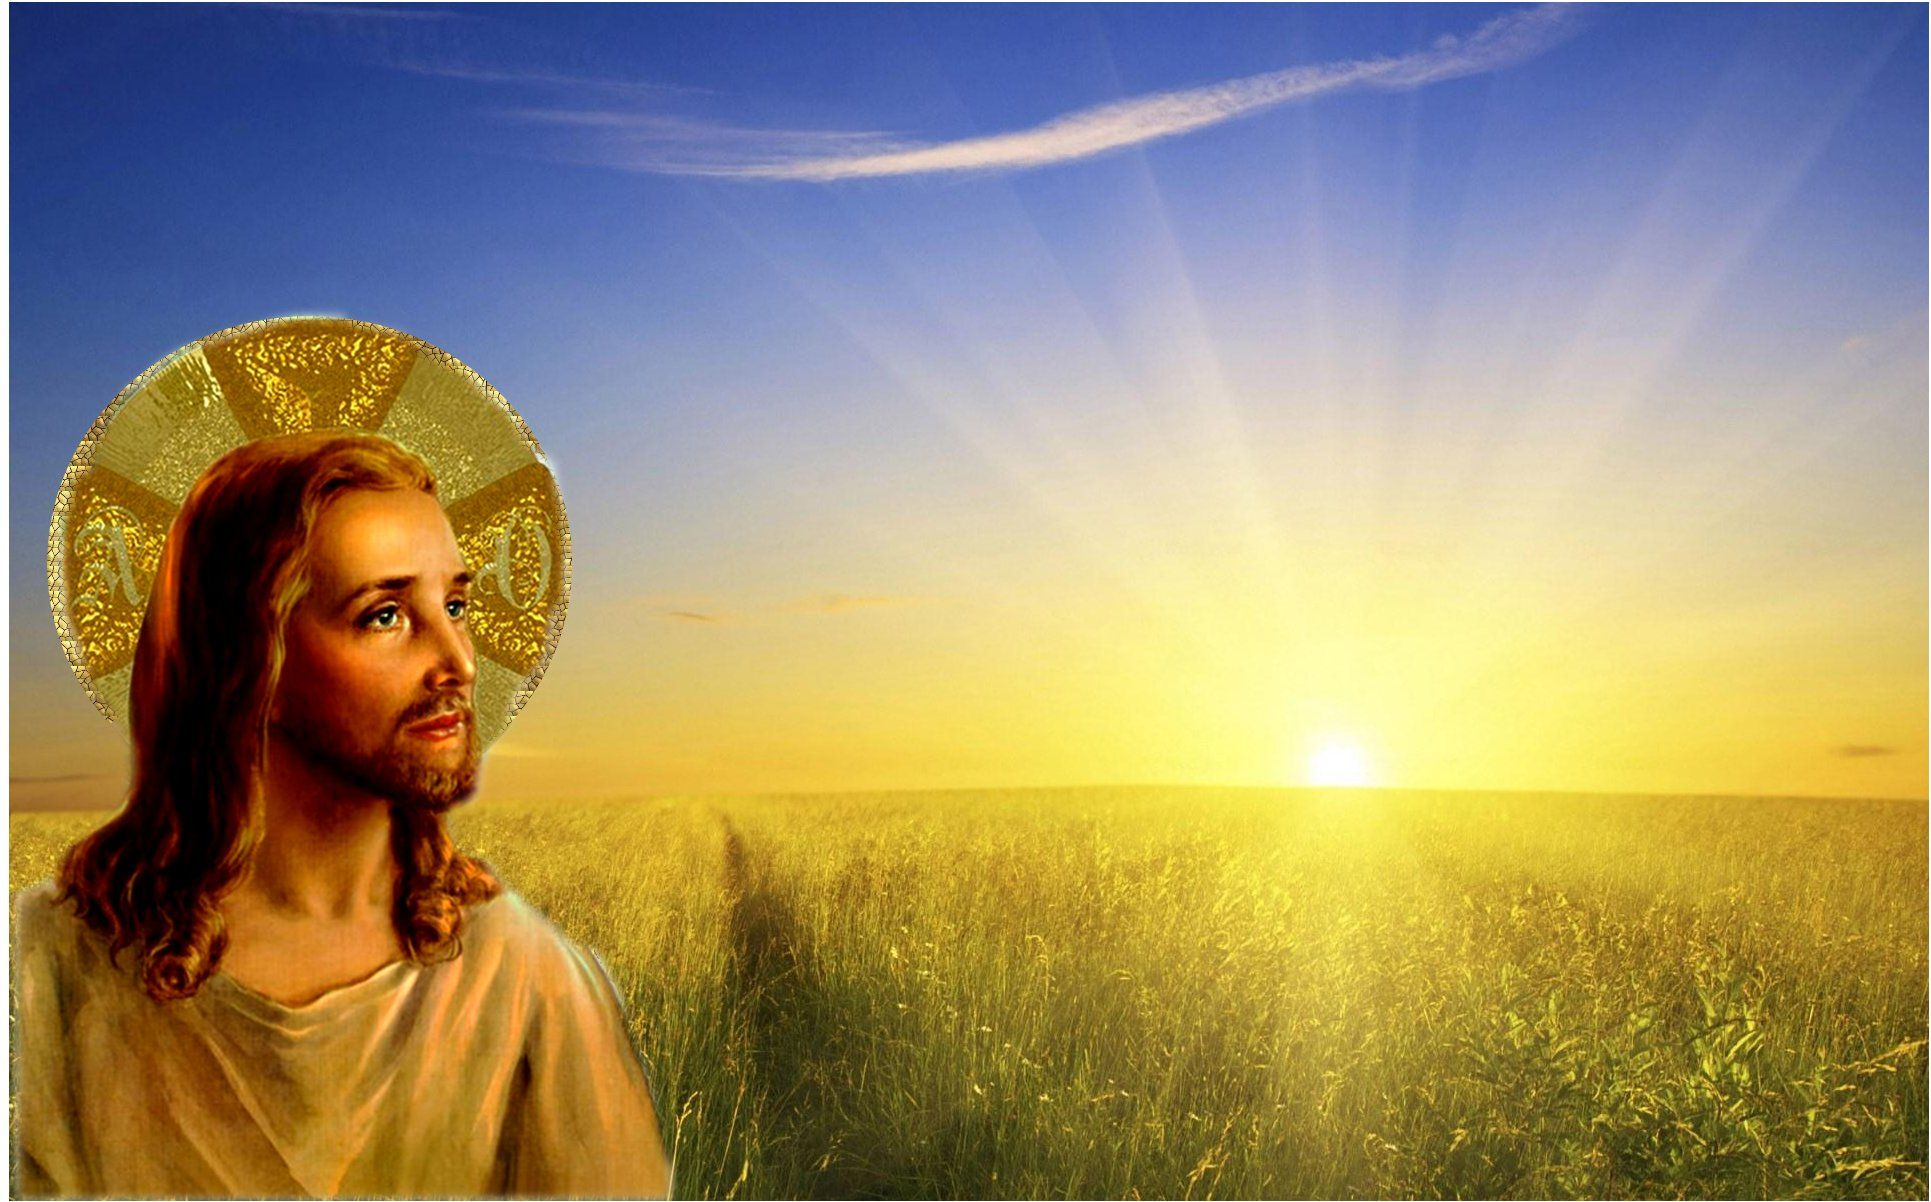 Jesuschrist Background Images 56 1931x1202